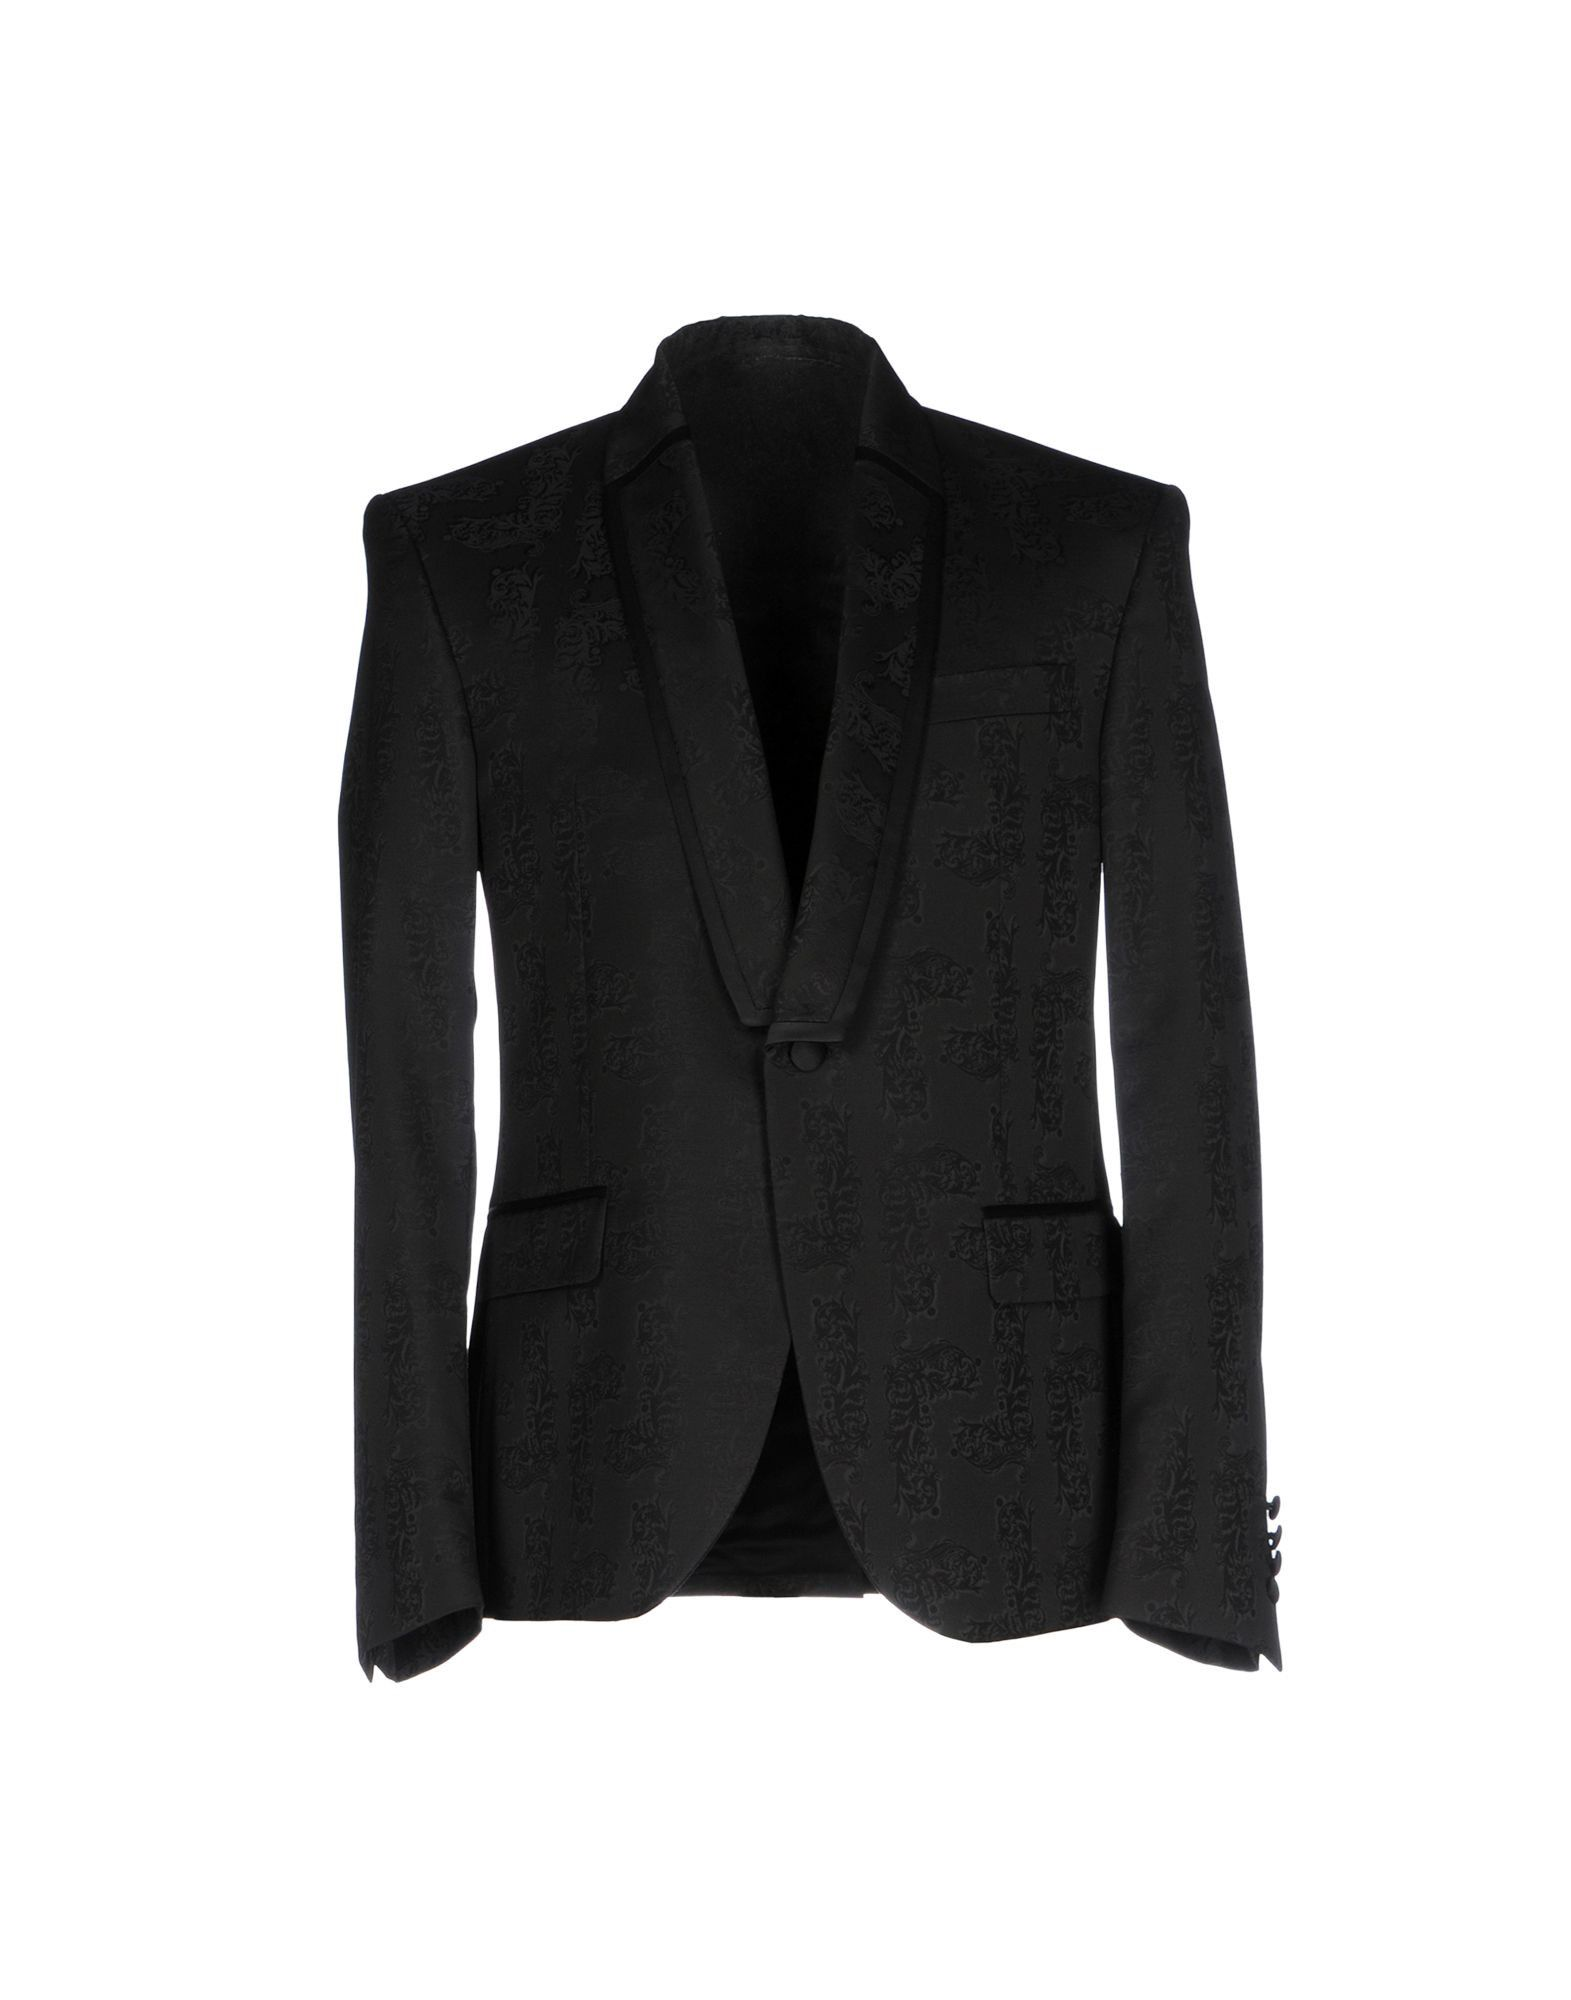 VERSACE Blazer.  versace  cloth   Blazers Pour Hommes, Blazers Noirs,  Versace 36897ff22f0